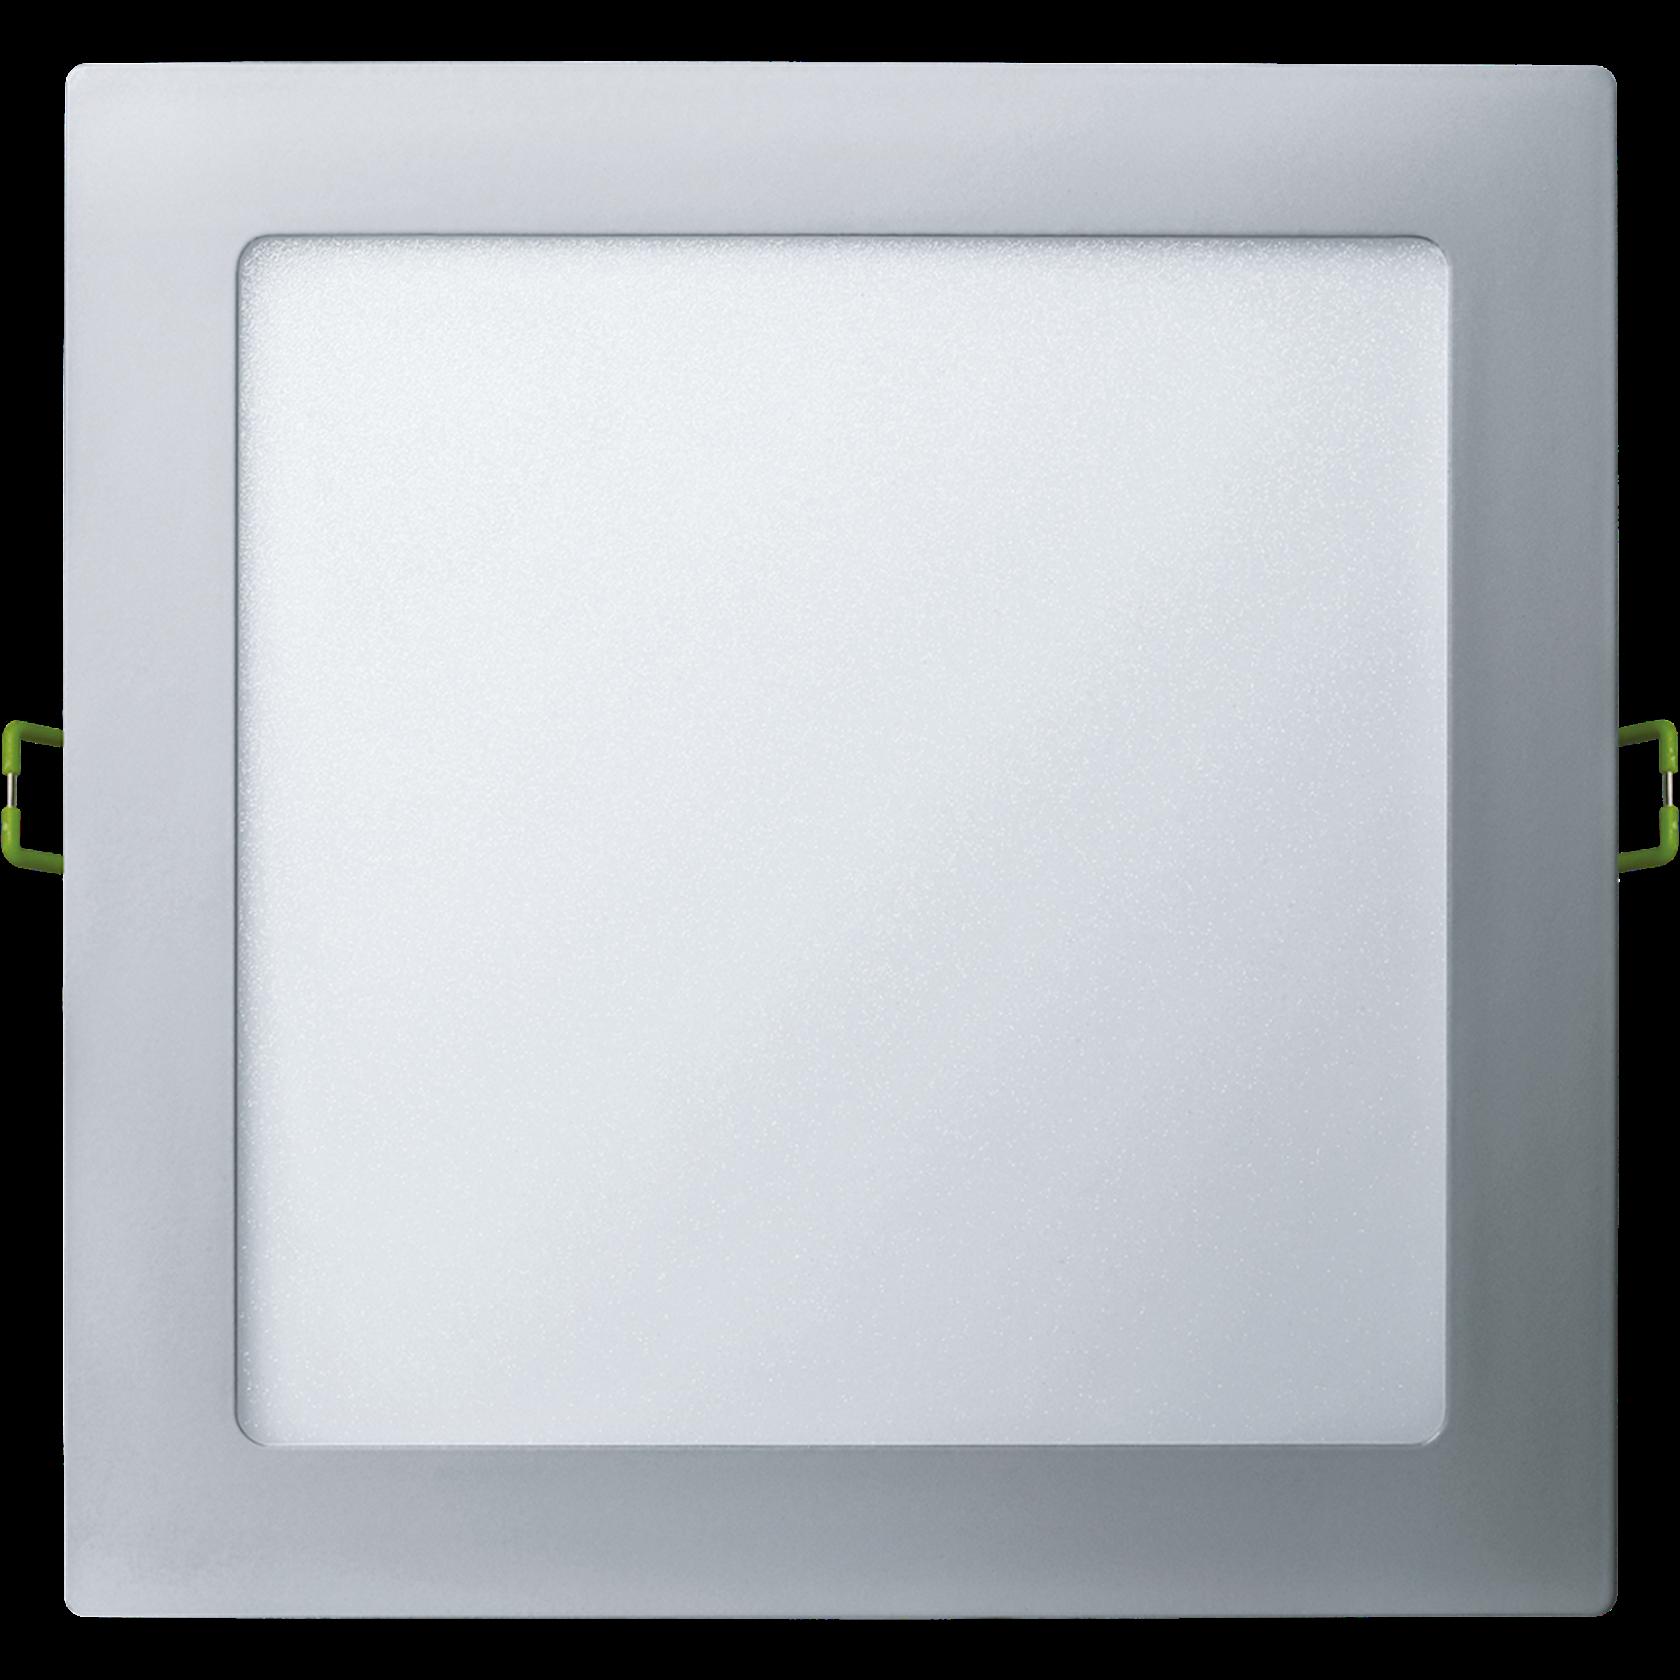 Quraşdırılan LED çıraq Navigator NLP-S1, 19Vt